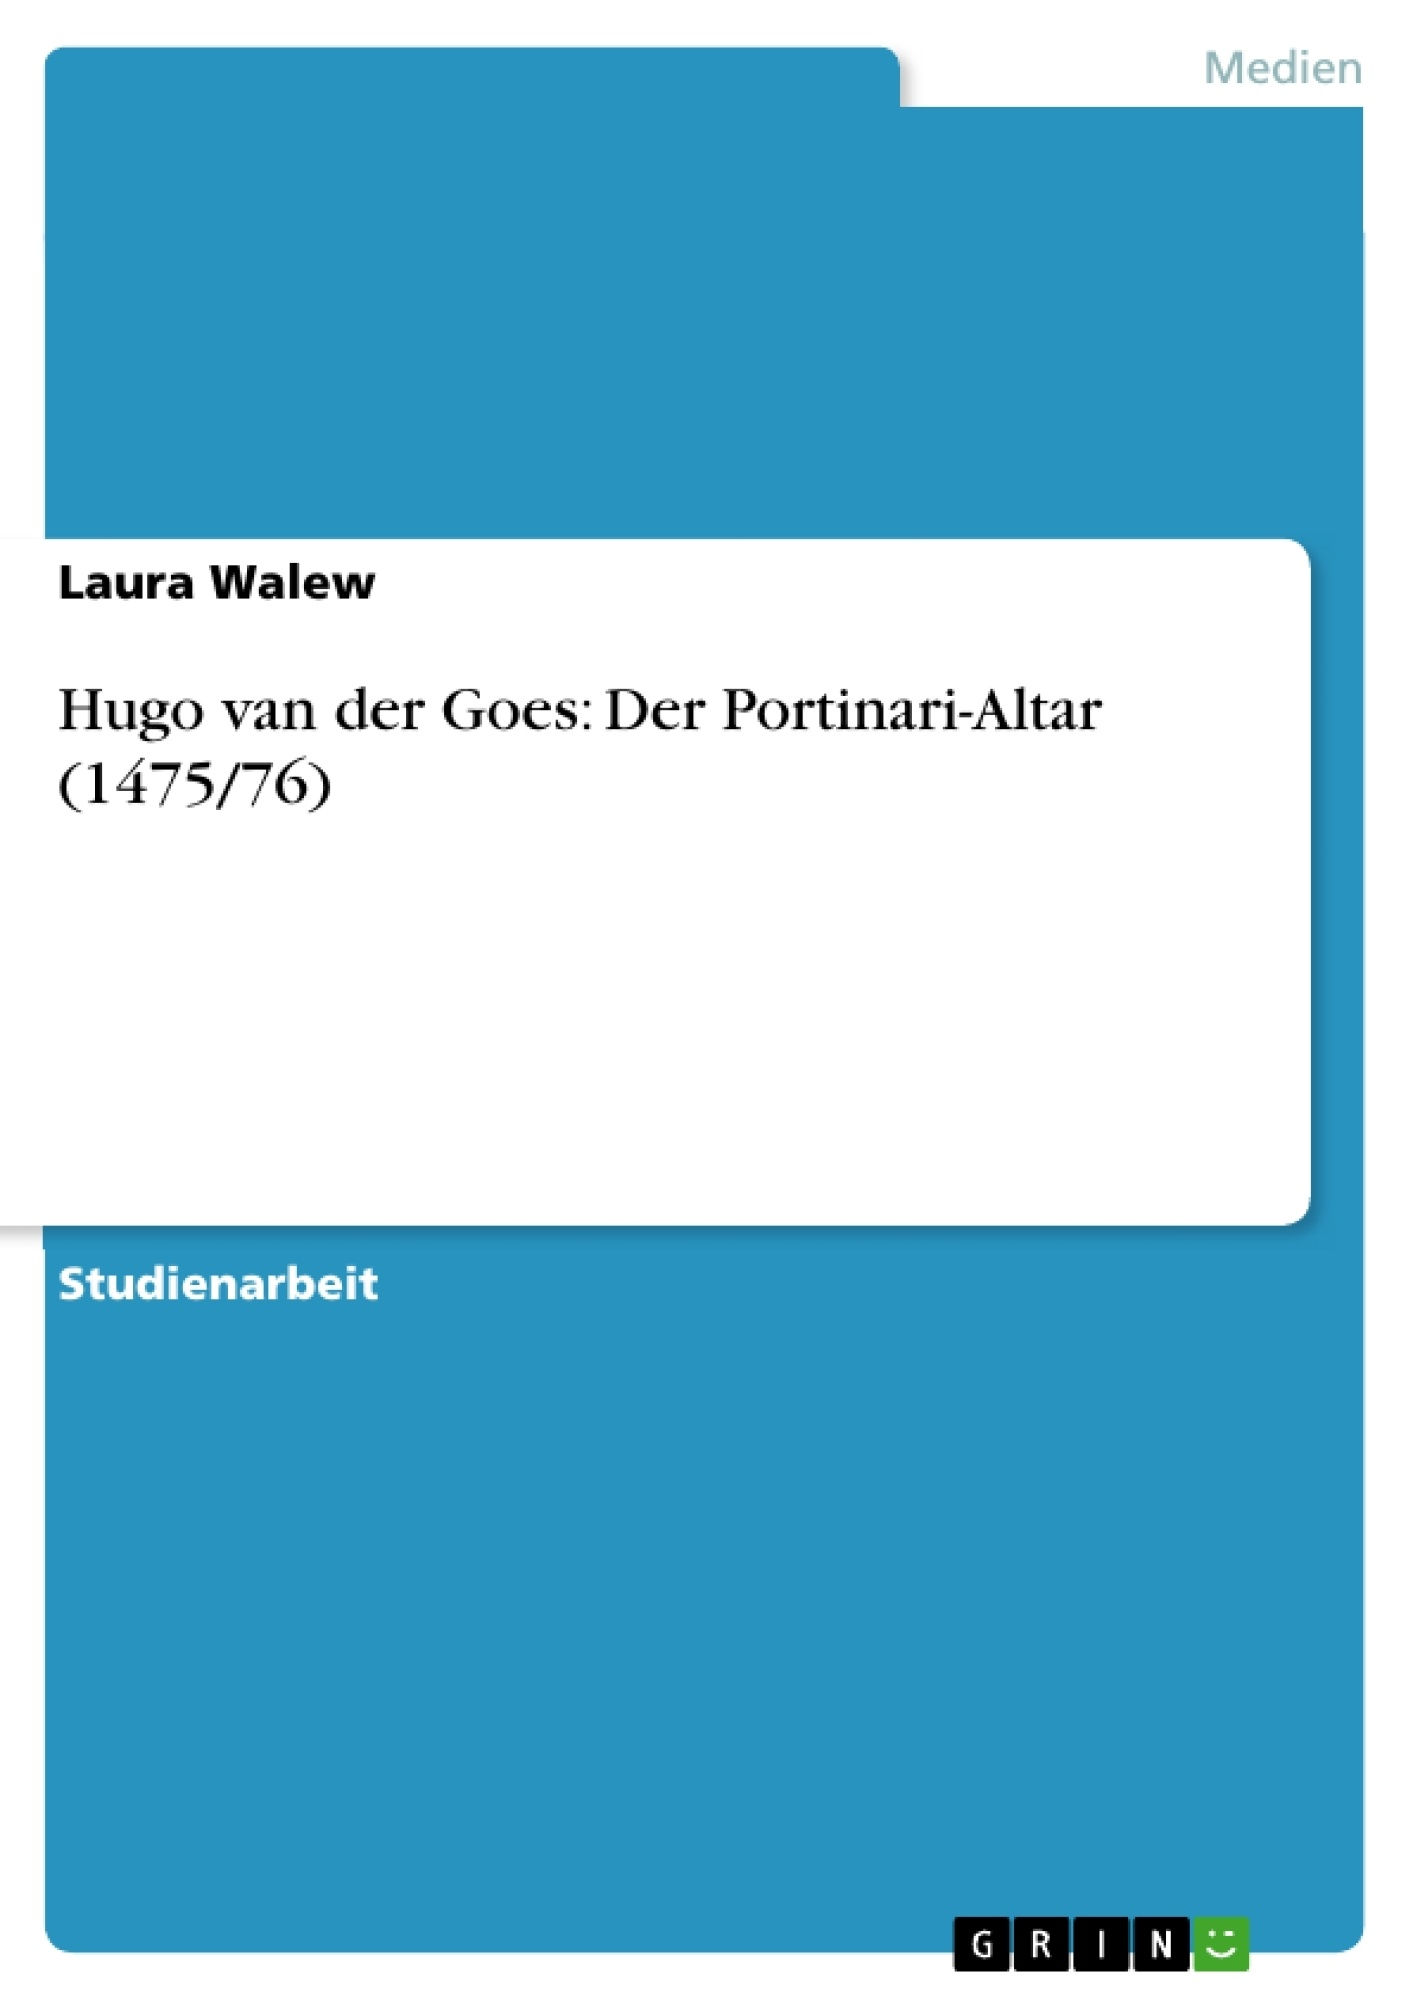 Titel: Hugo van der Goes: Der Portinari-Altar (1475/76)